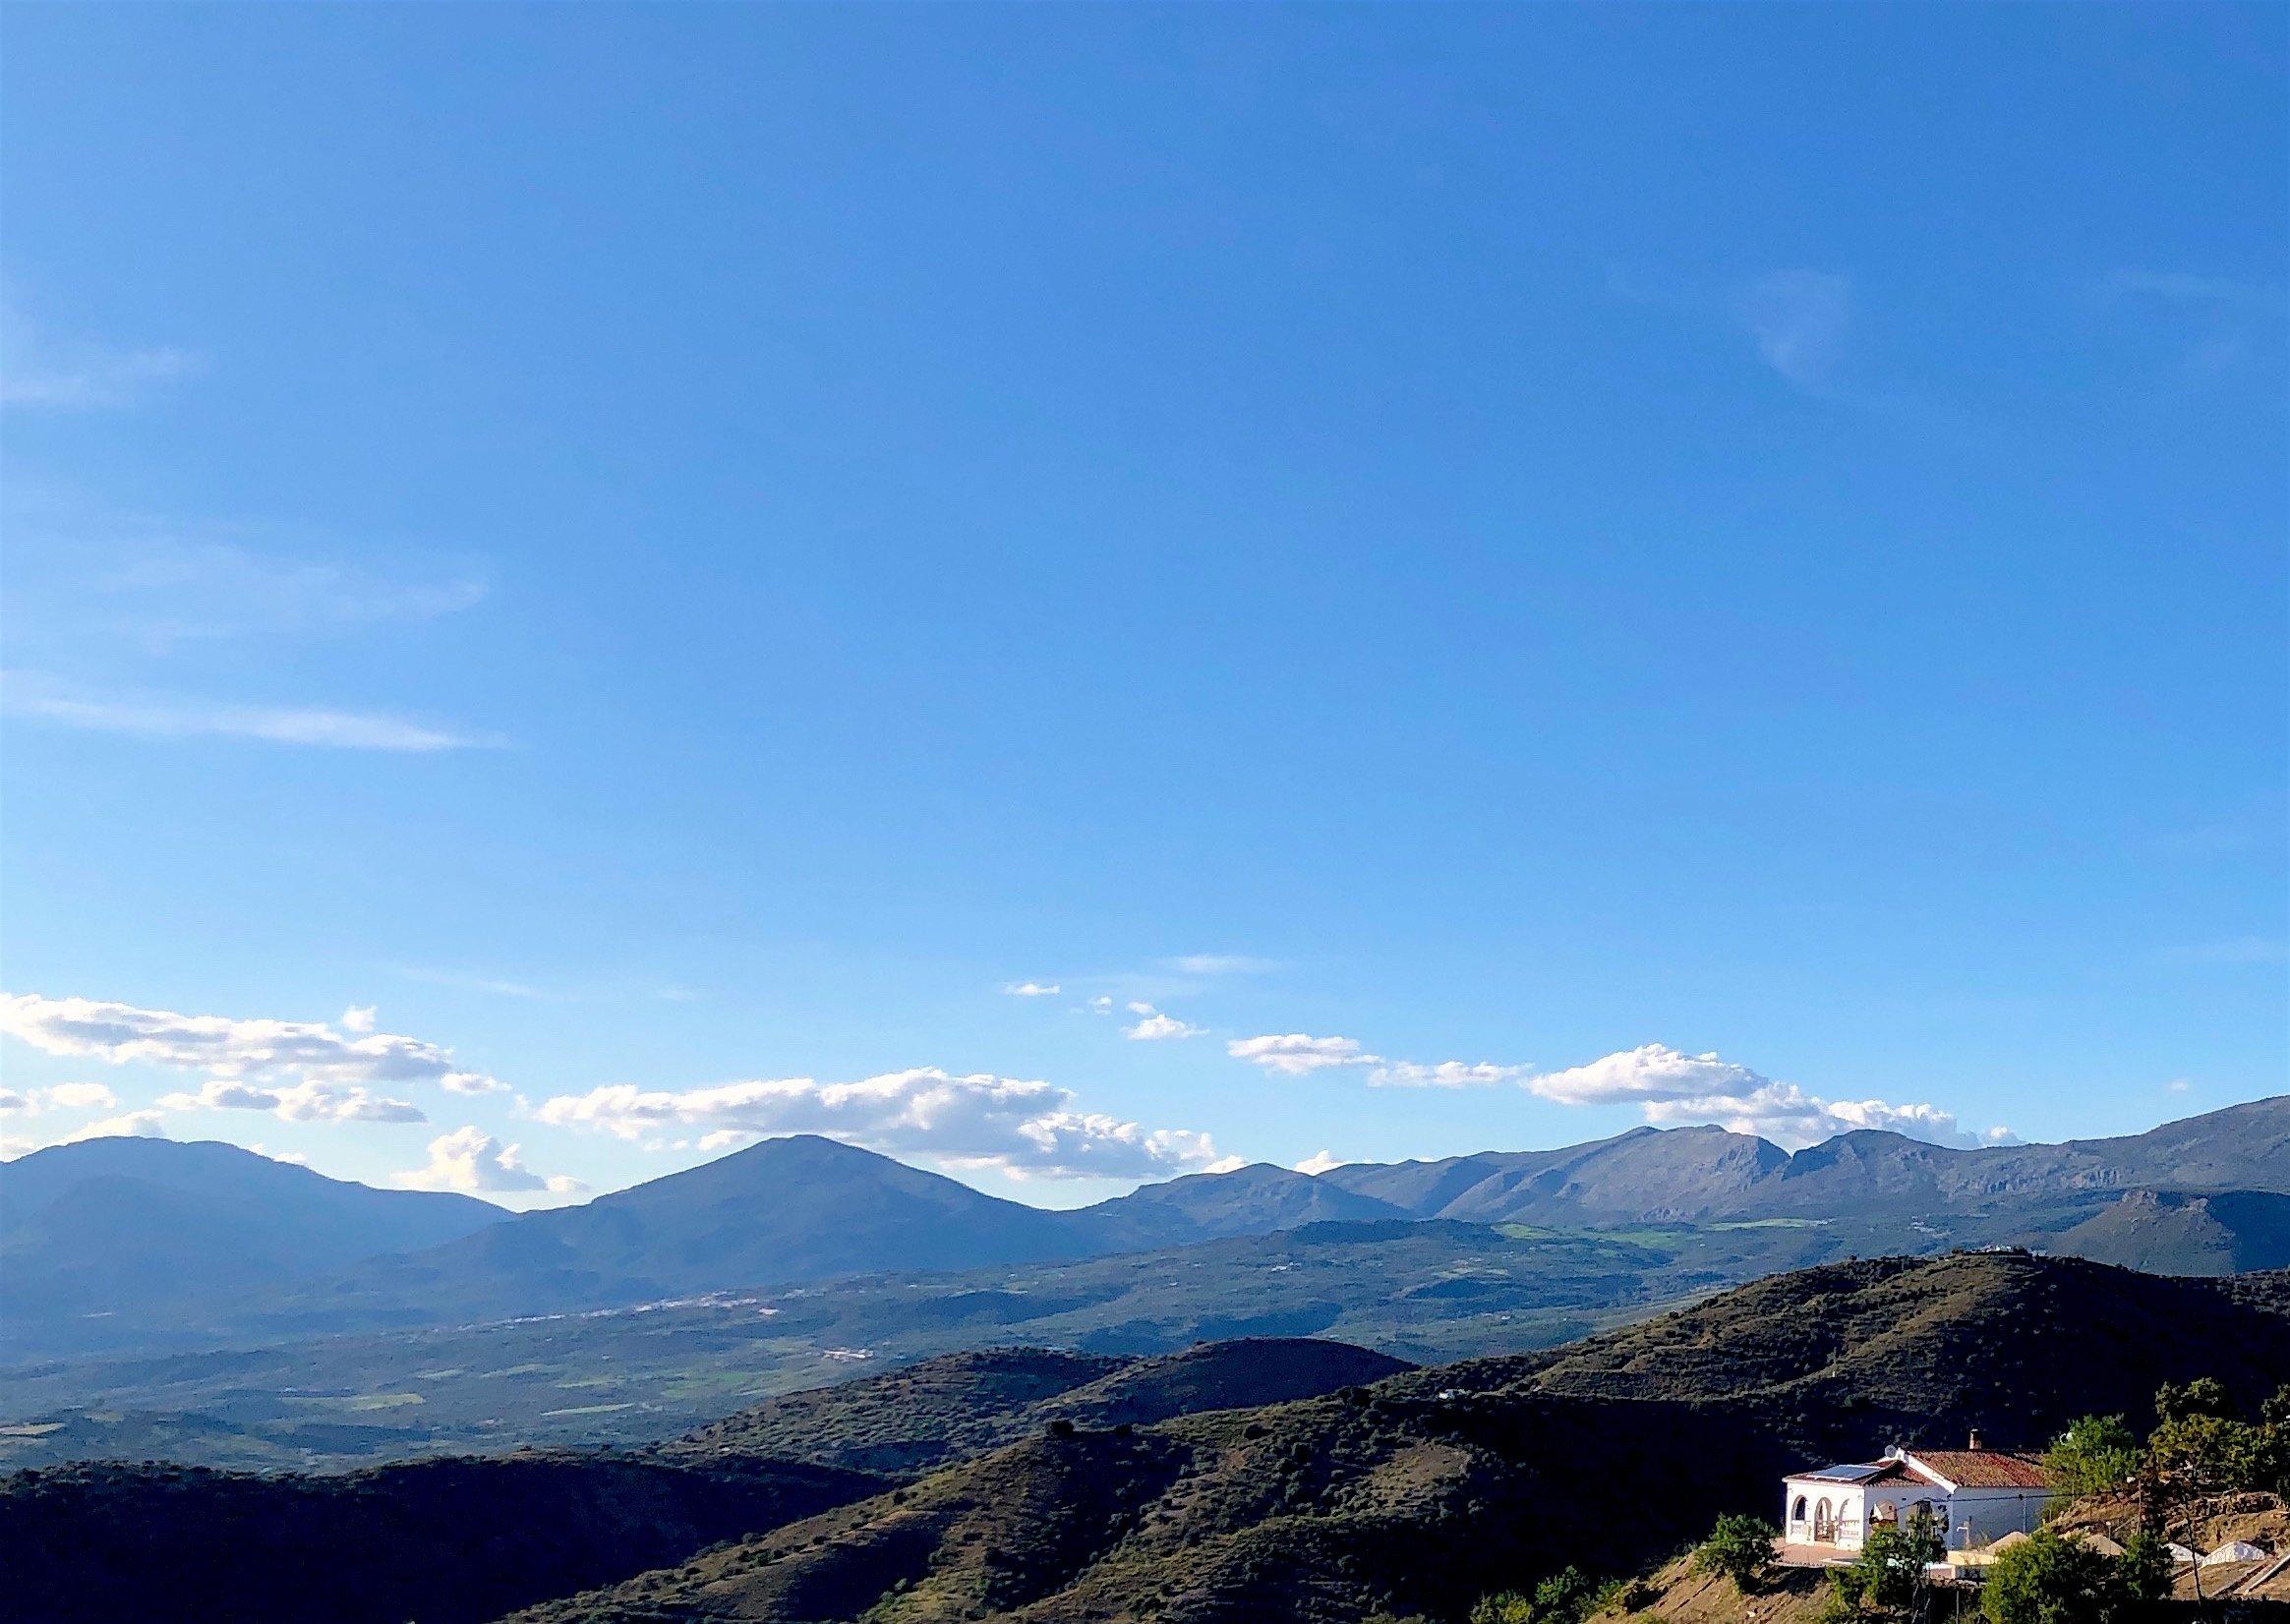 View on Lake Vinuela and La Maroma